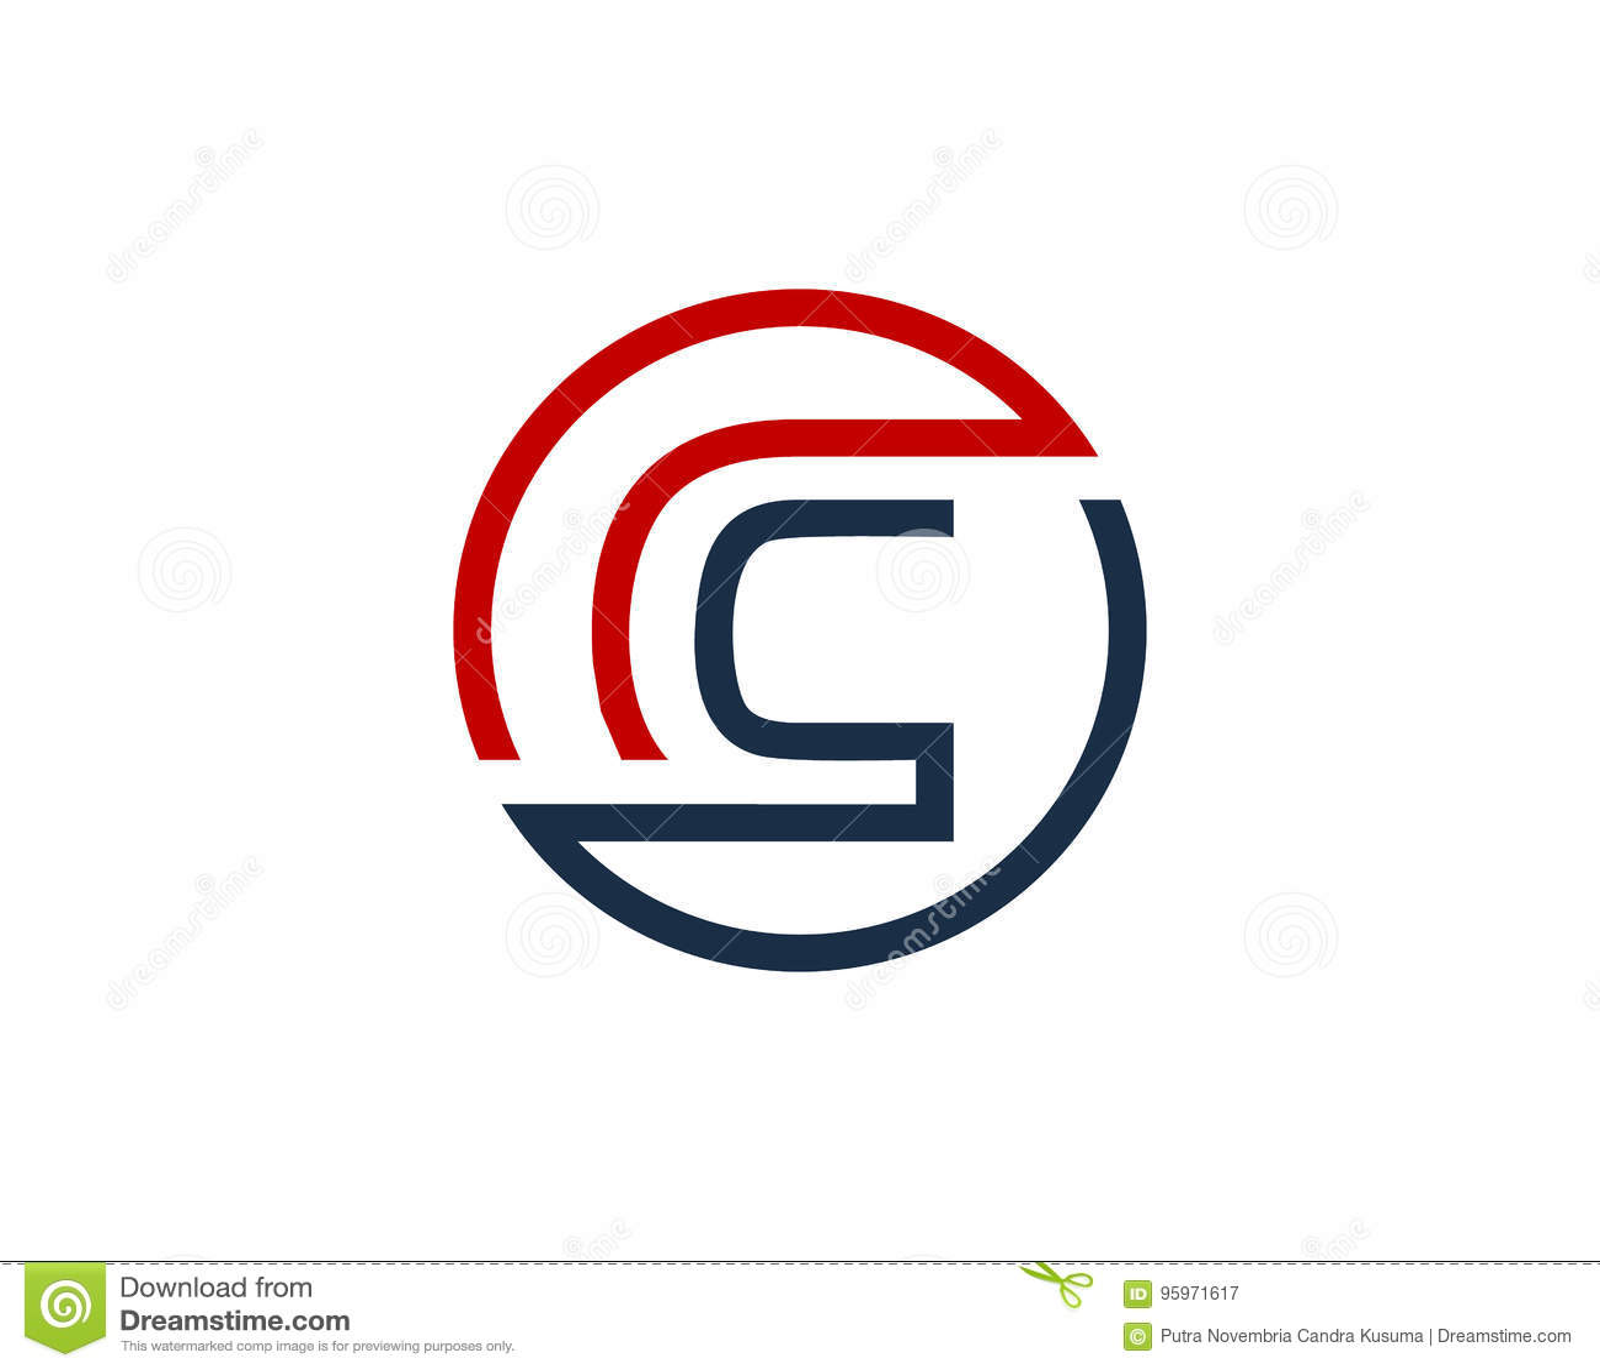 Letter c circle line icon logo design element stock vector letter c circle line icon logo design element biocorpaavc Images